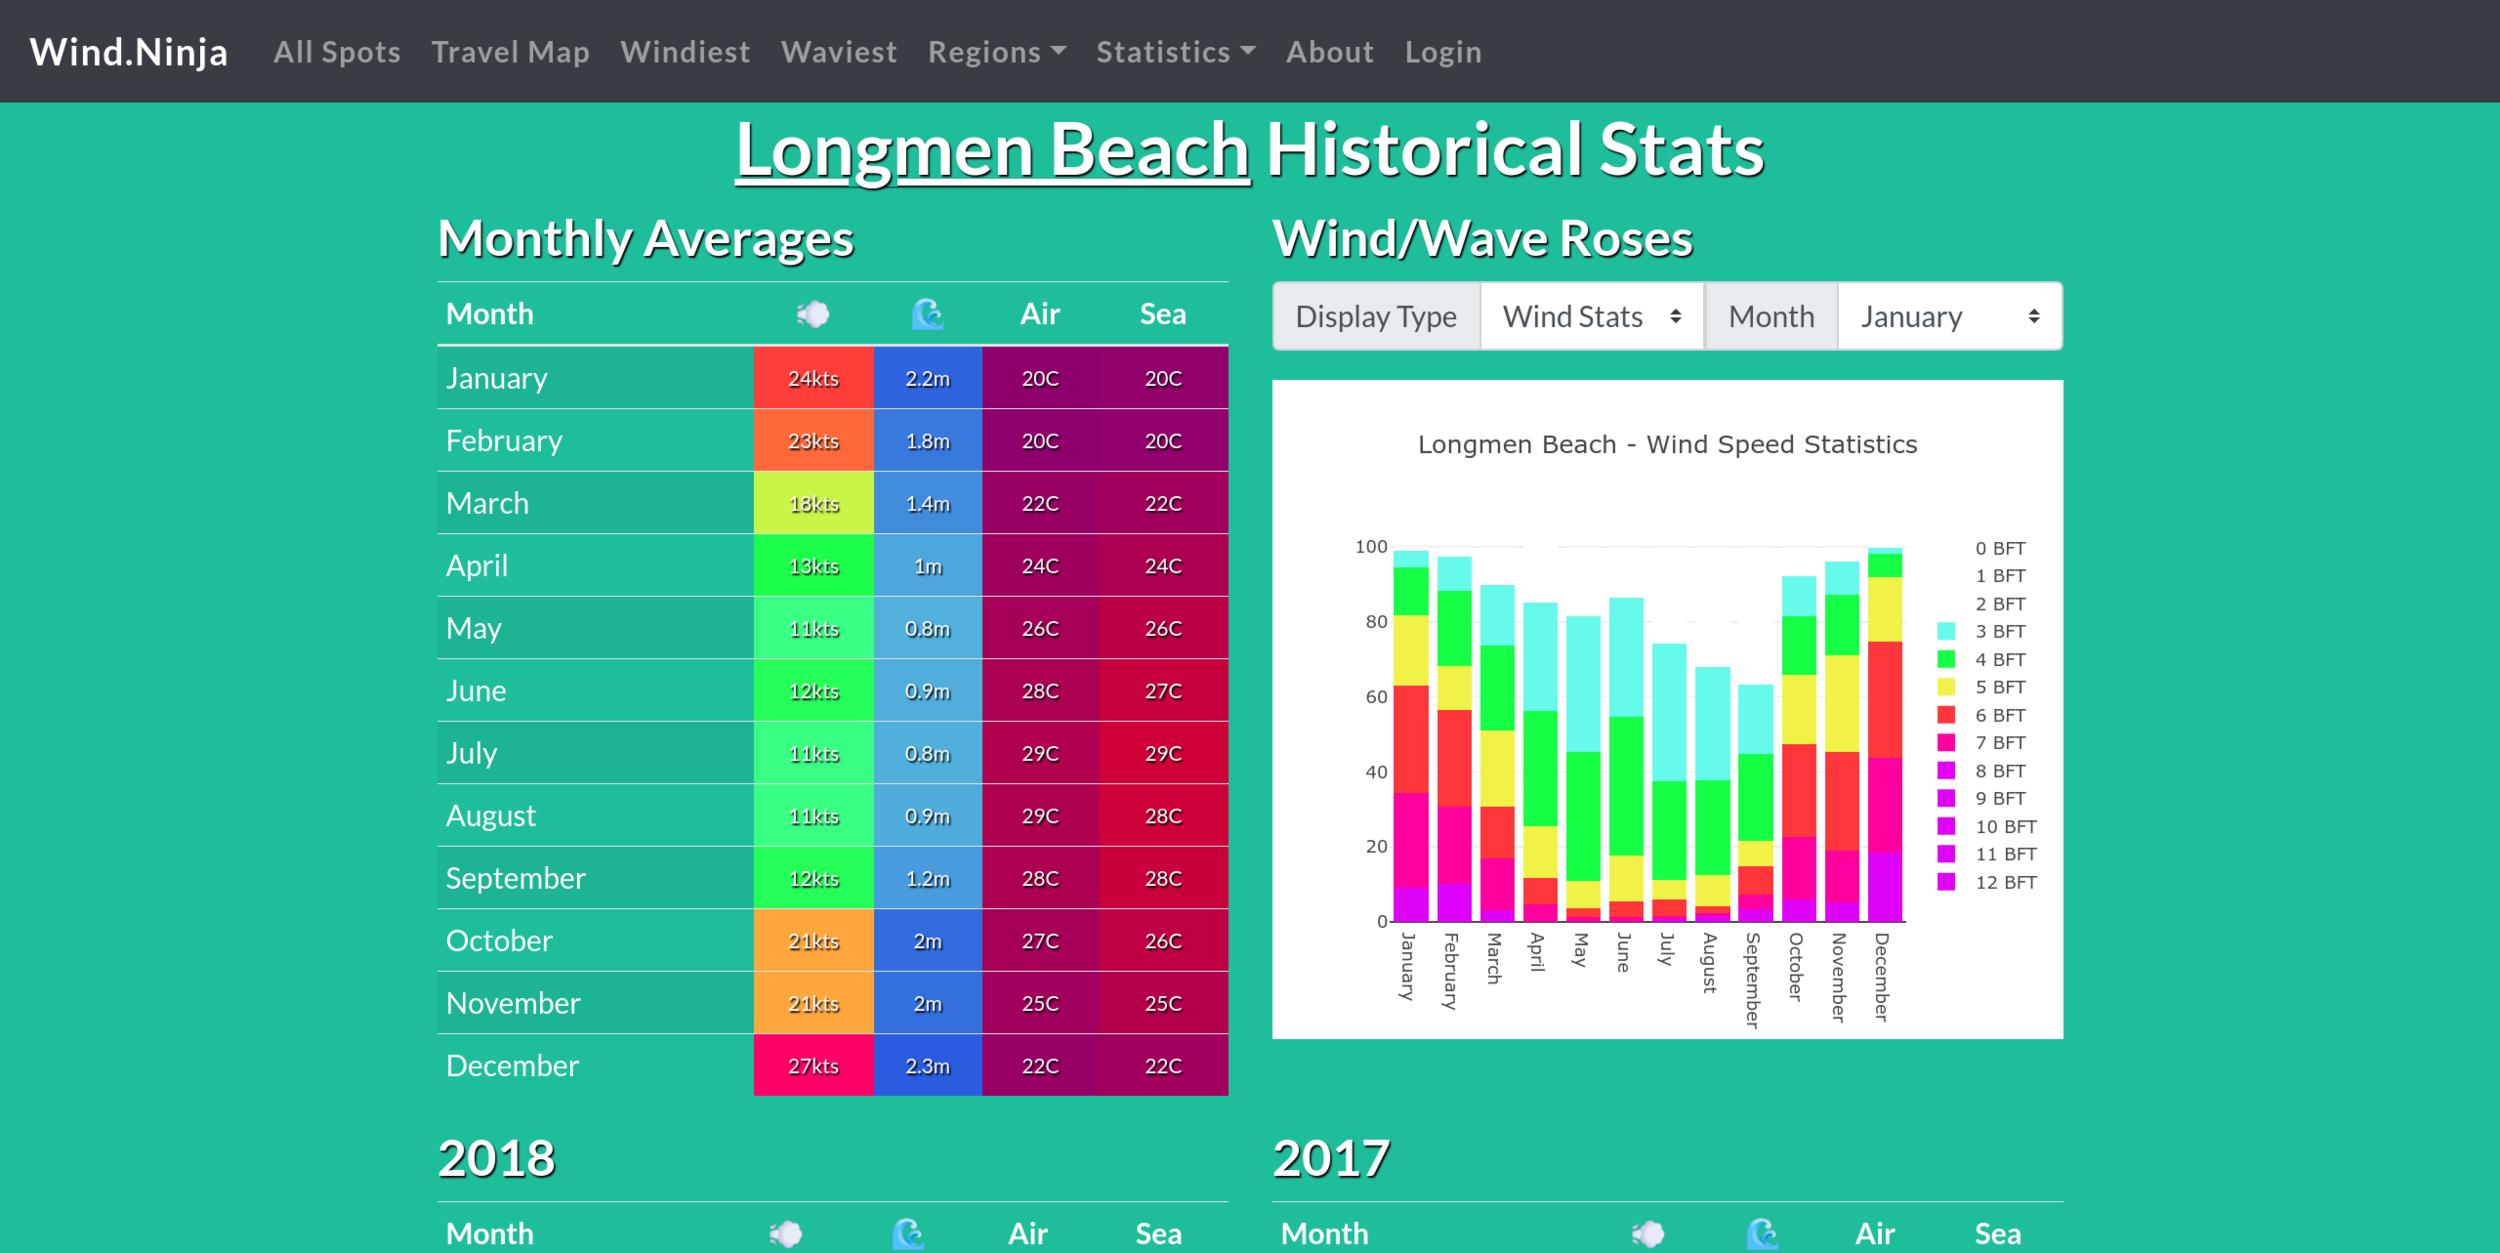 Wind Statistics of Longmen Beach